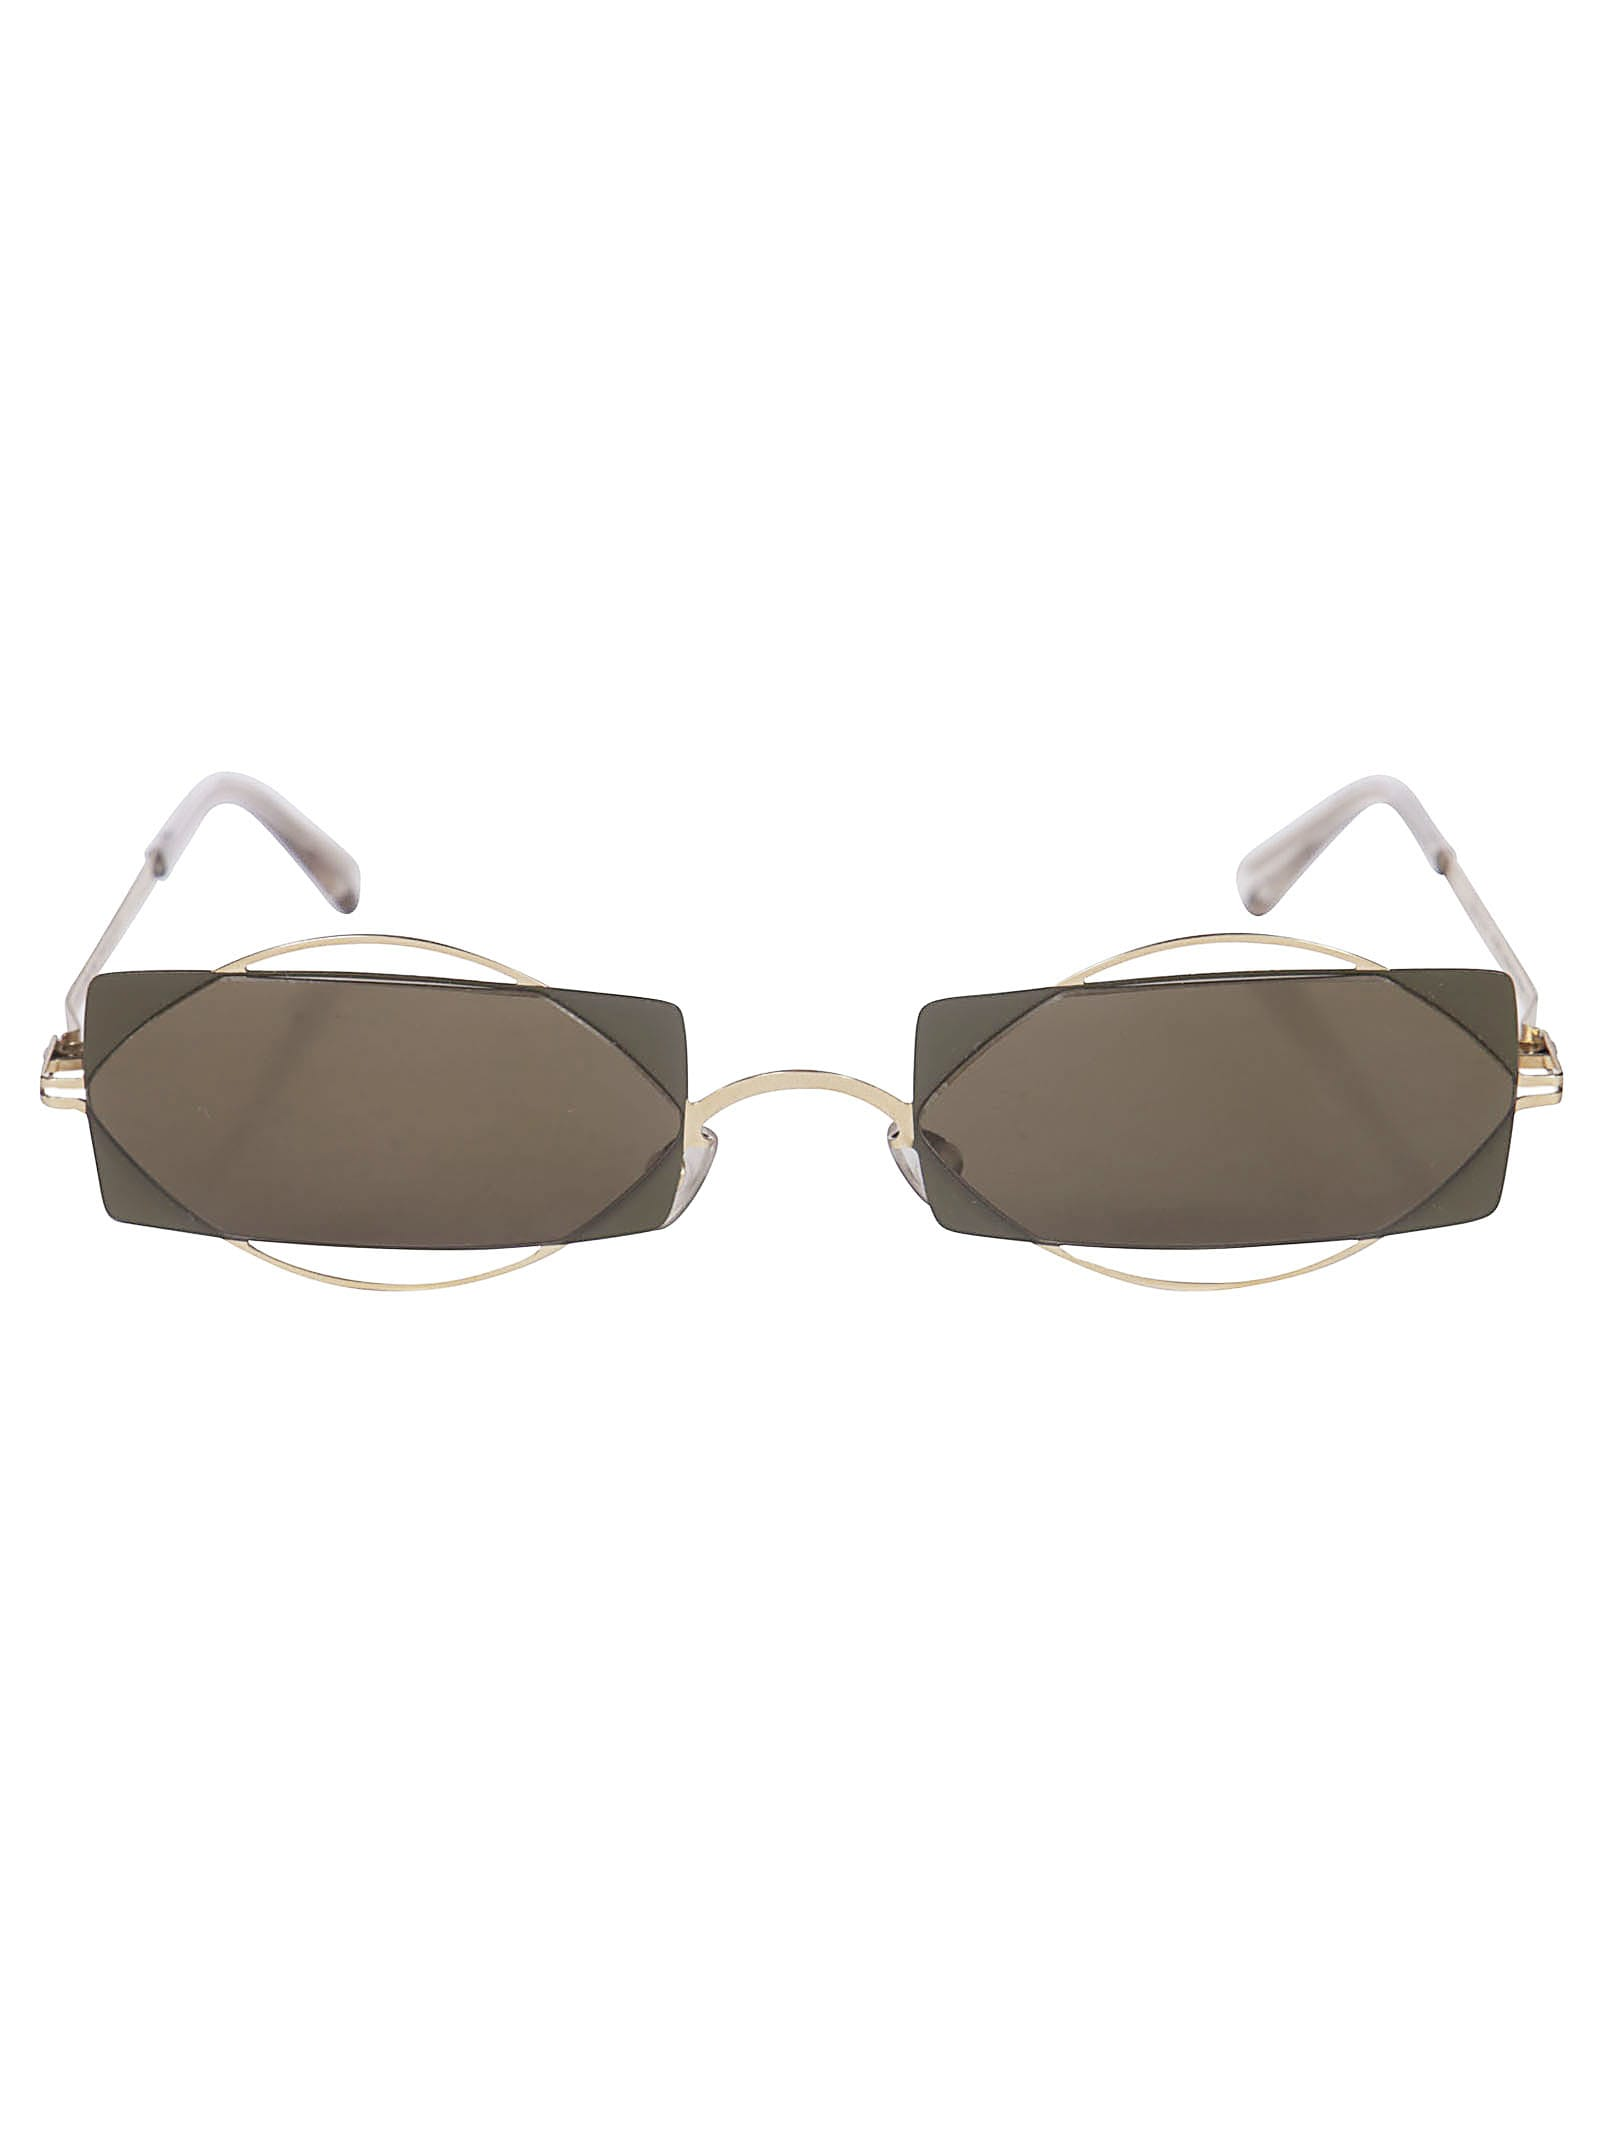 Mykita Damir Doma Charlotte Sunglasses